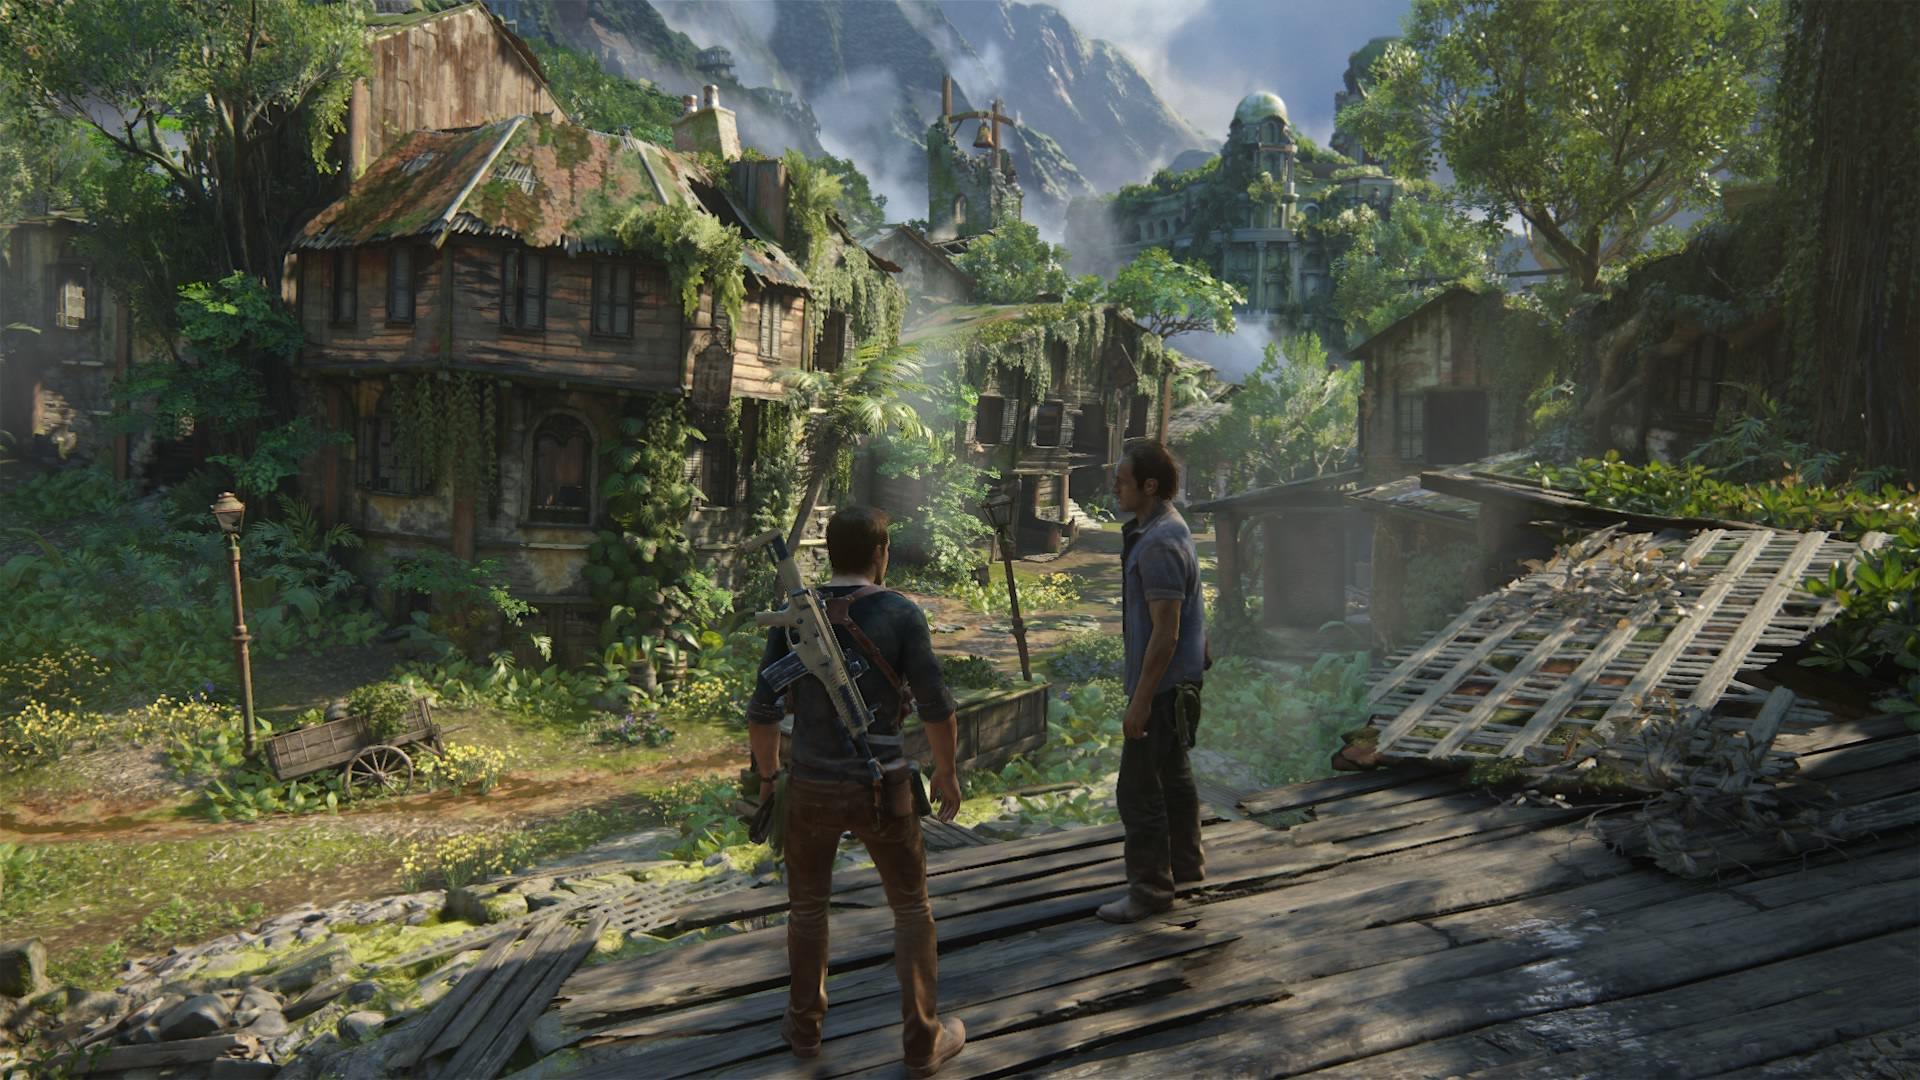 Nathan i Sam na tropie legendarnego skarbu. Taka sceneria to dobra okazja na pogaduszkę.